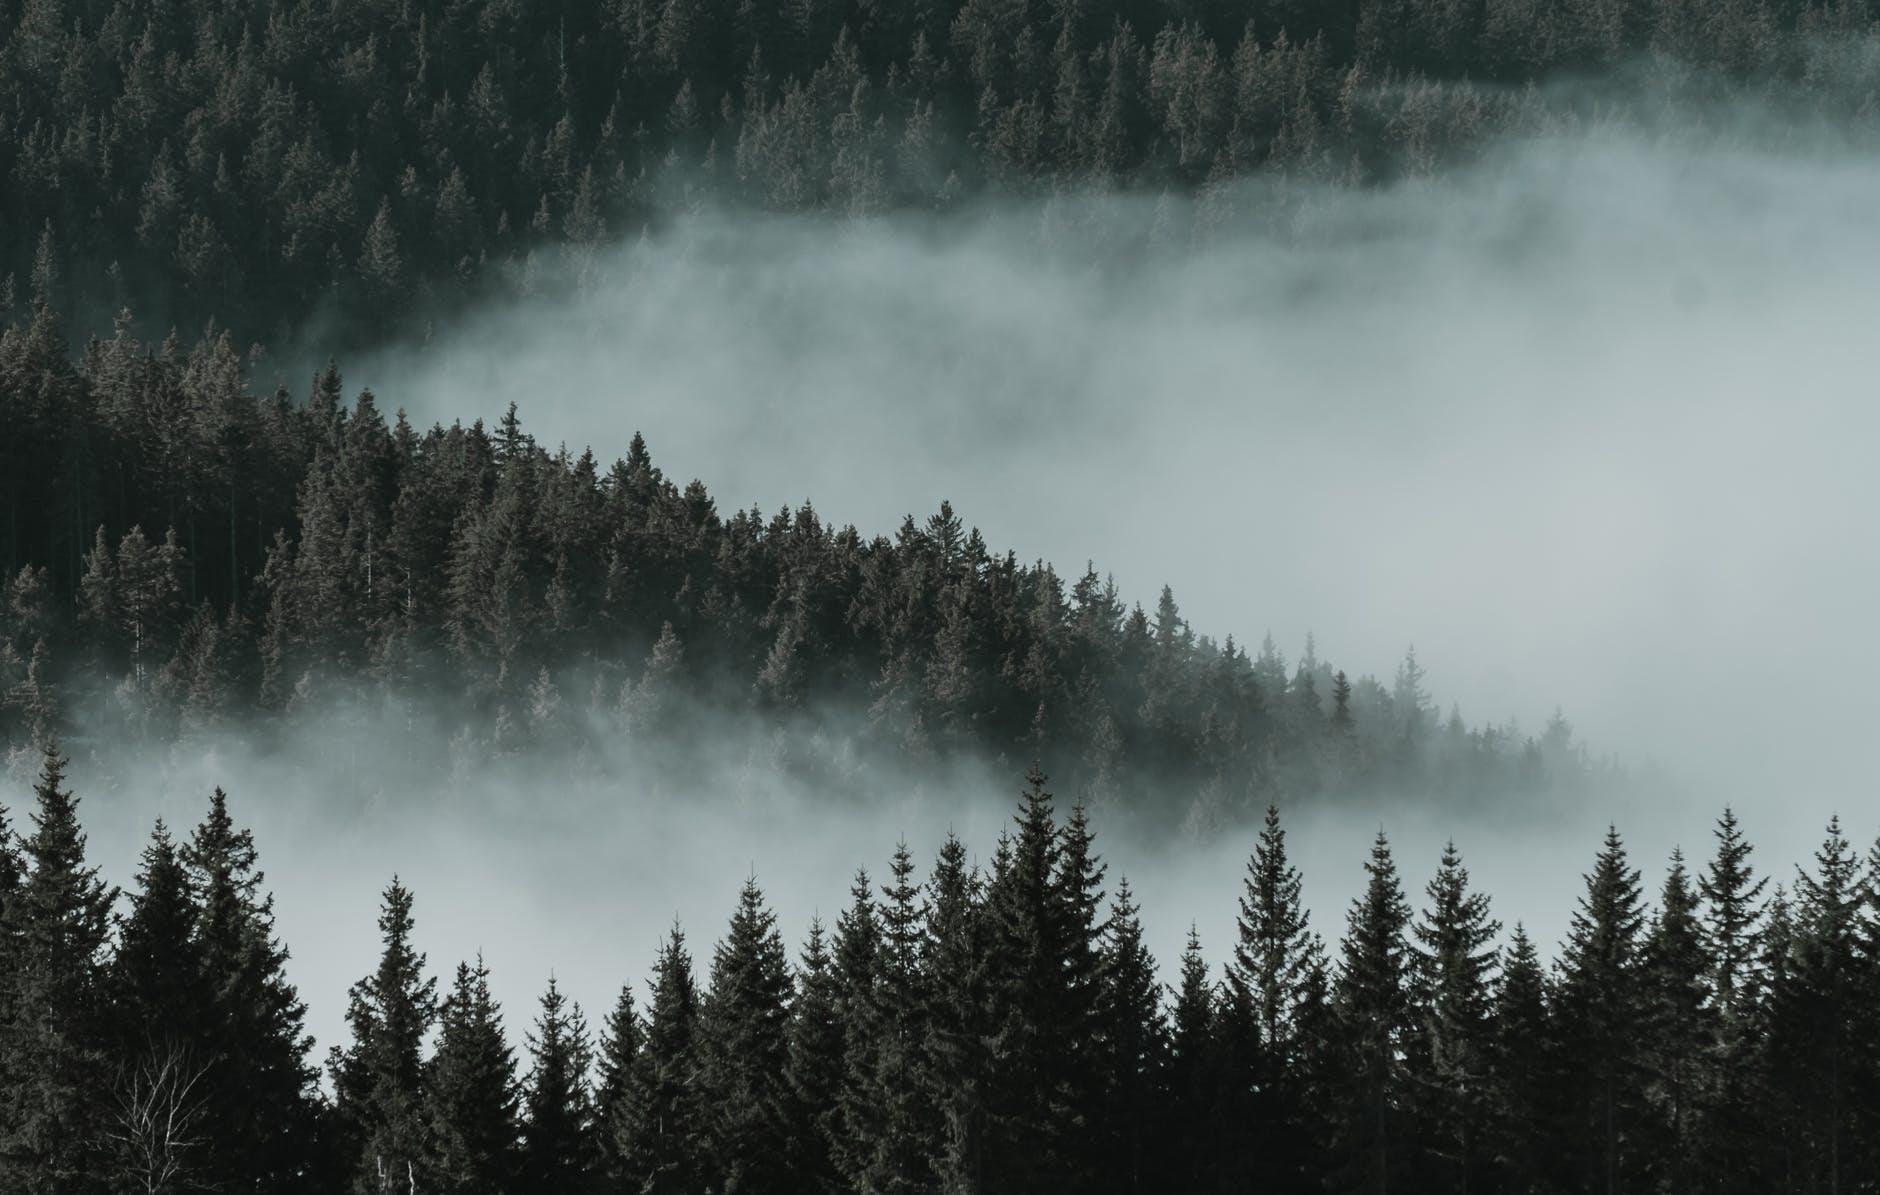 bird s eye view of pine trees